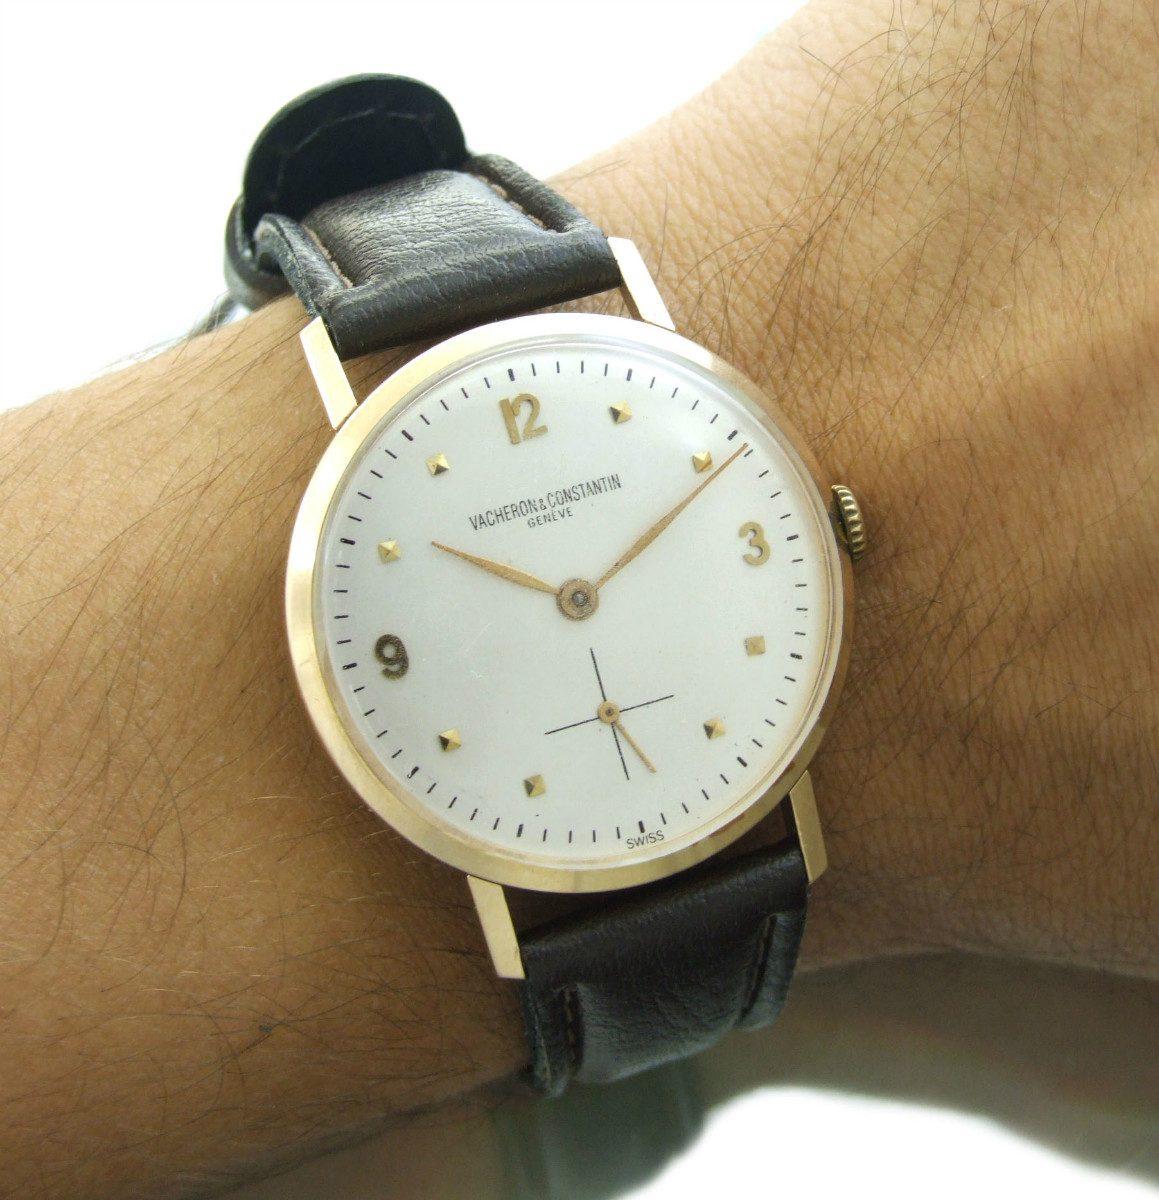 9108633f059 relógio masculino vacheron   constantin geneve em ouro j5183. Carregando  zoom.